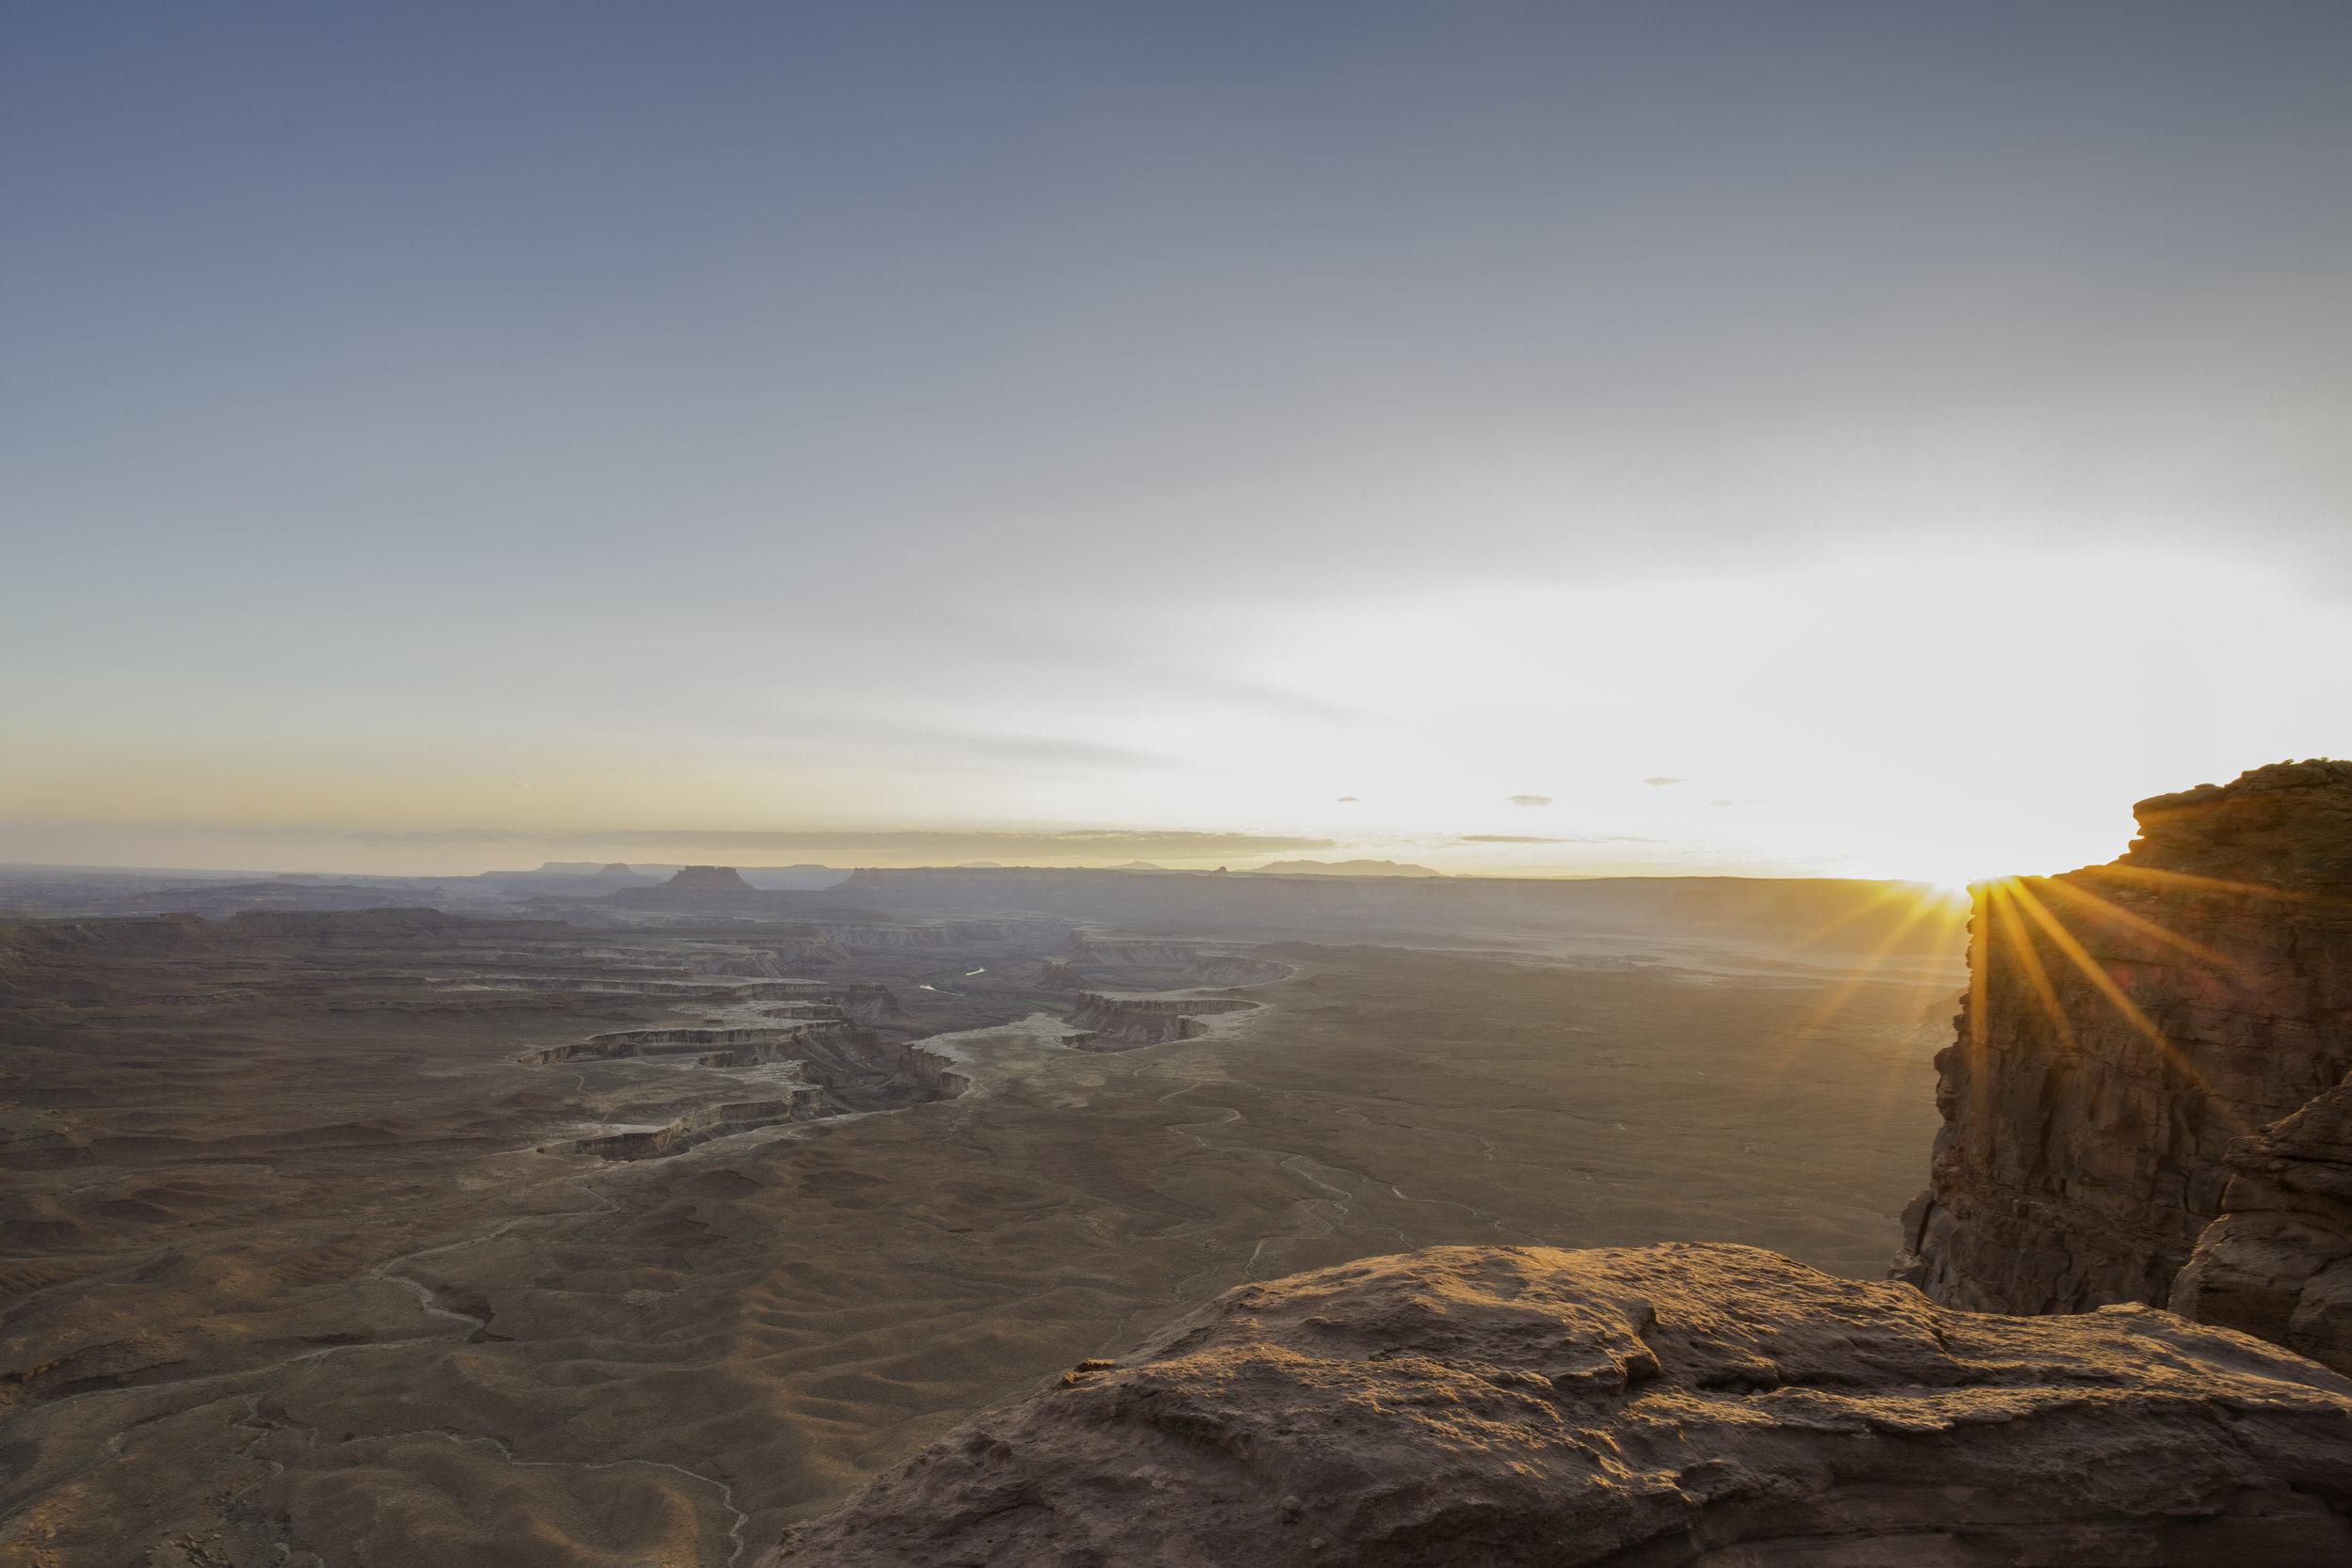 Green River Overlook, Green River, Soda Springs Basin, Canyonlands, Canyonlands National Park, Sunset, Moab, Utah